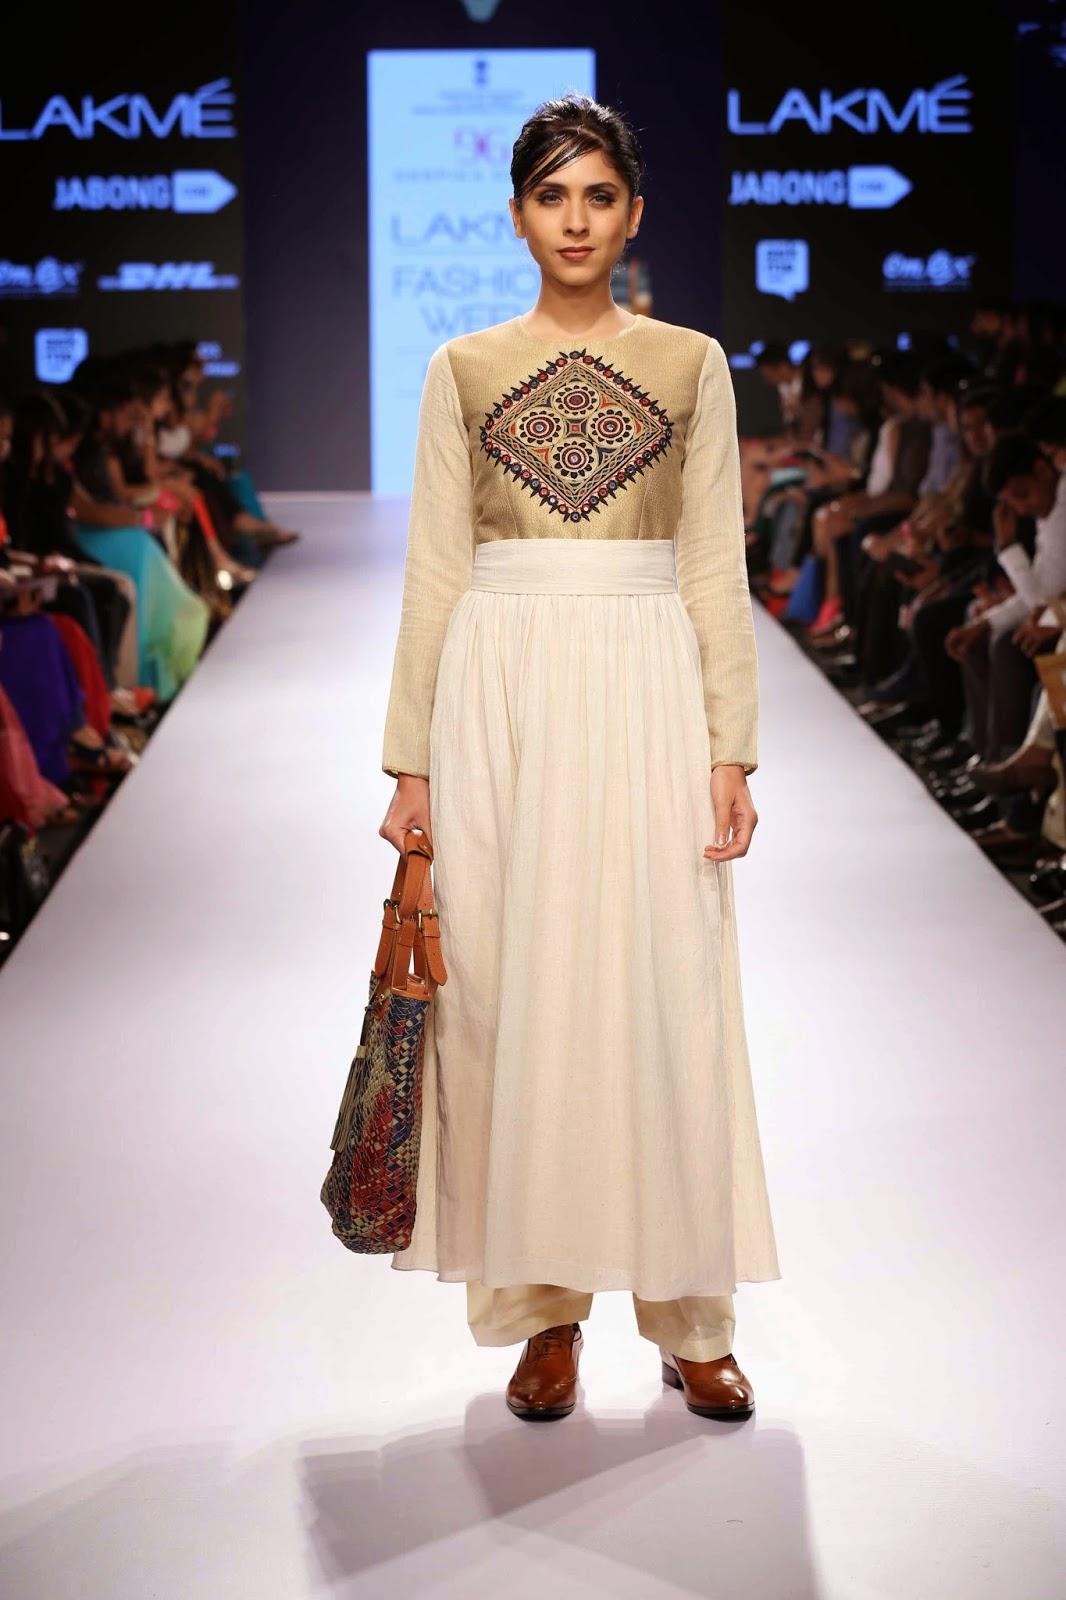 http://aquaintperspective.blogspot.in/, LIFW Day 2 Deepika Govind